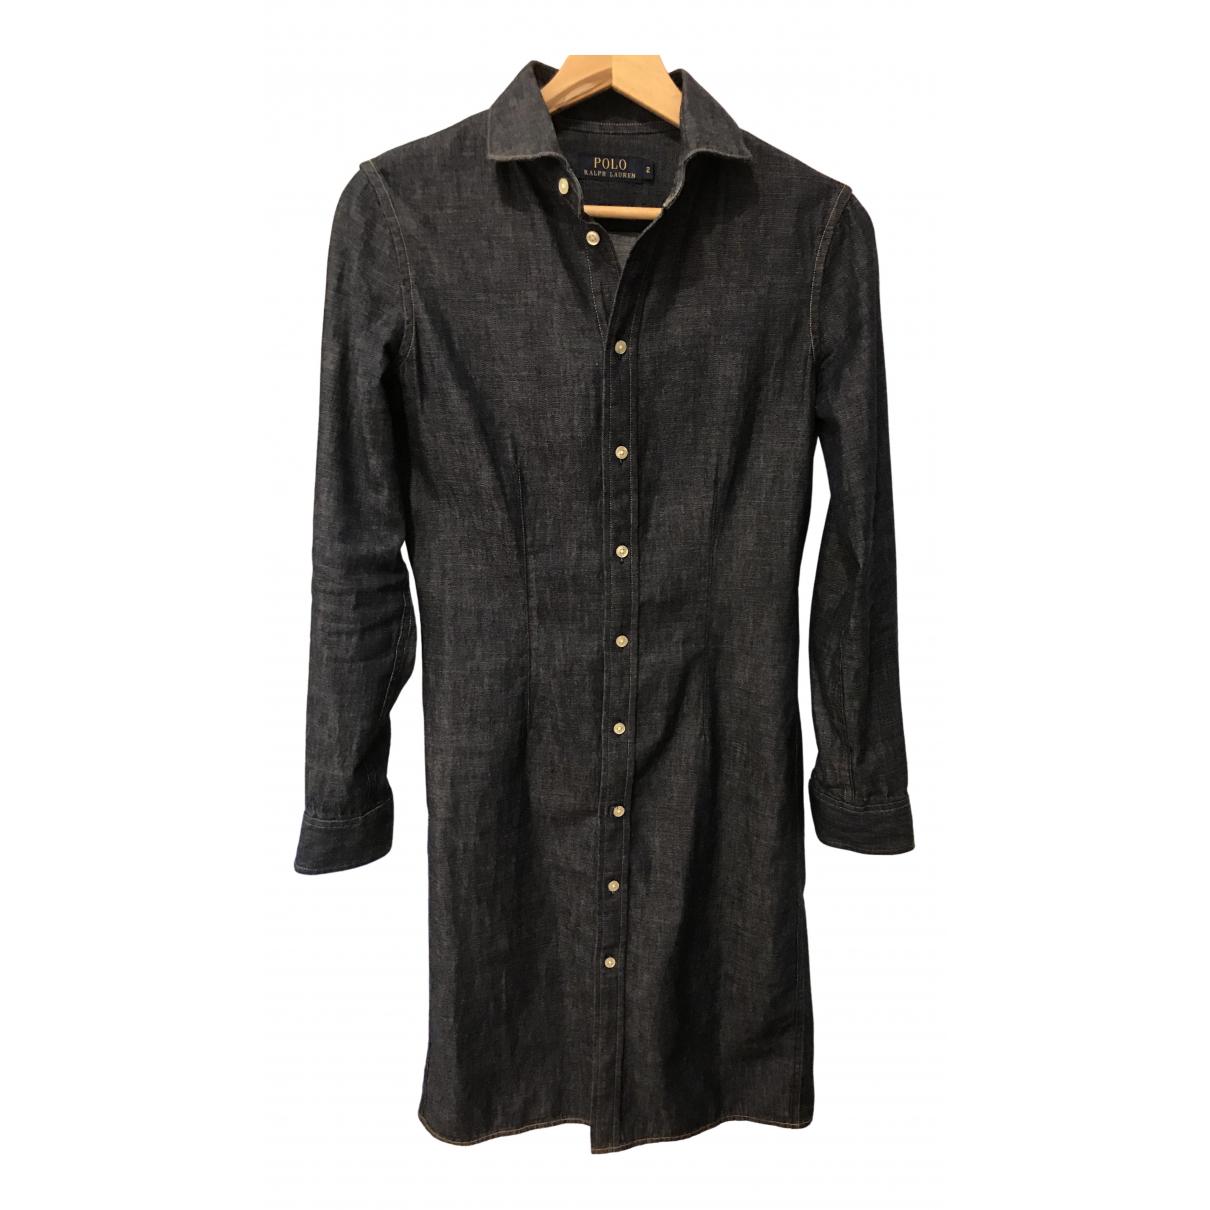 Polo Ralph Lauren N Blue Cotton coat for Women S International